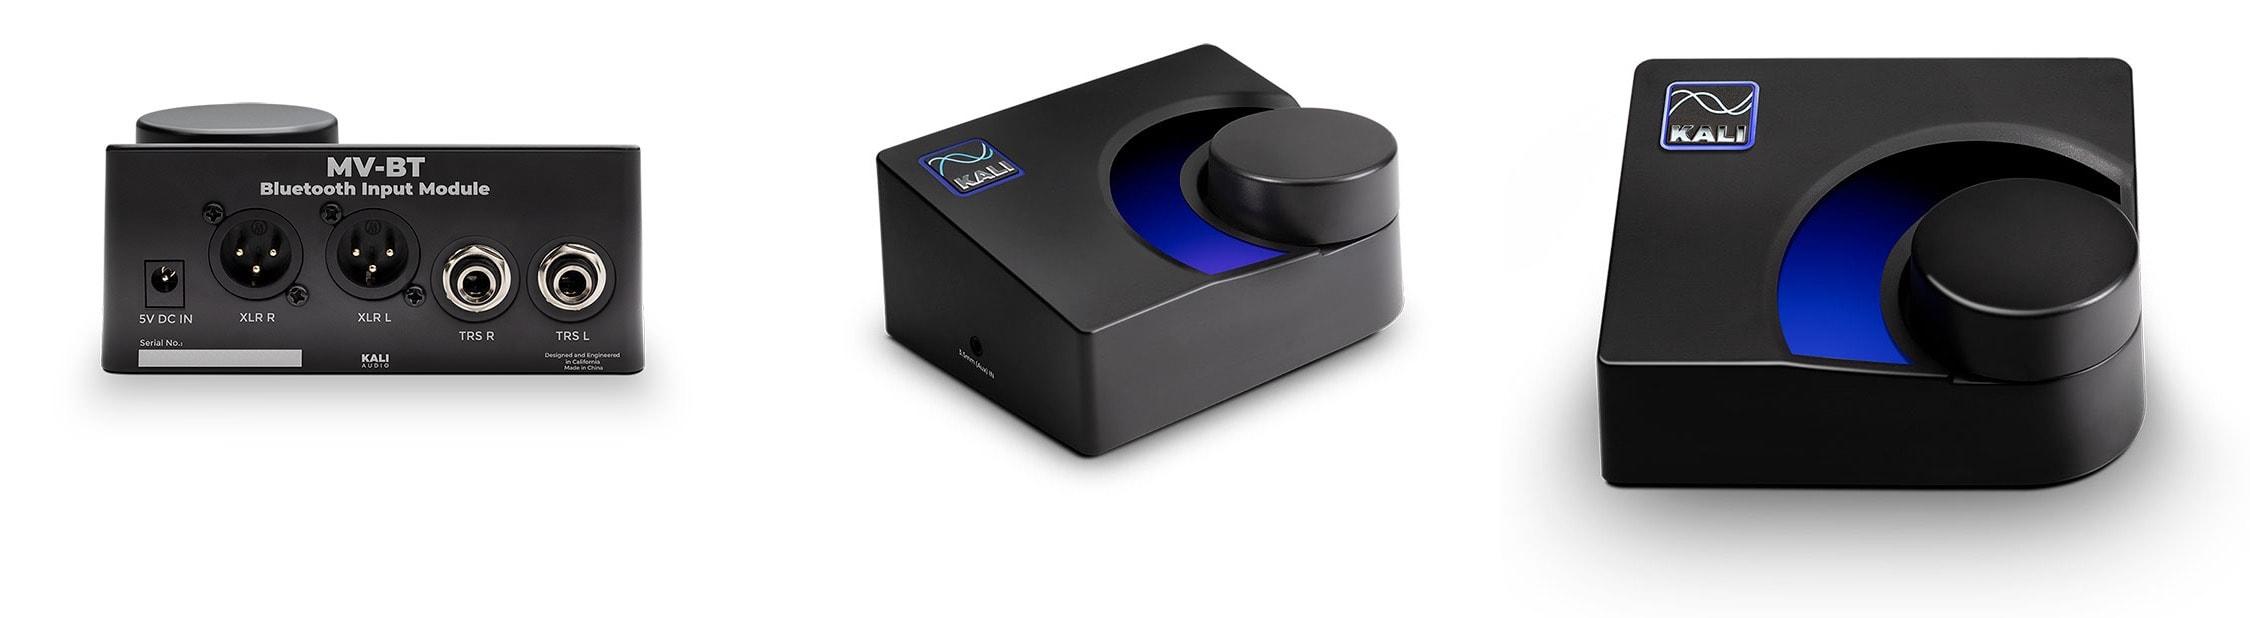 The Kali Audio Bluetooth Module.